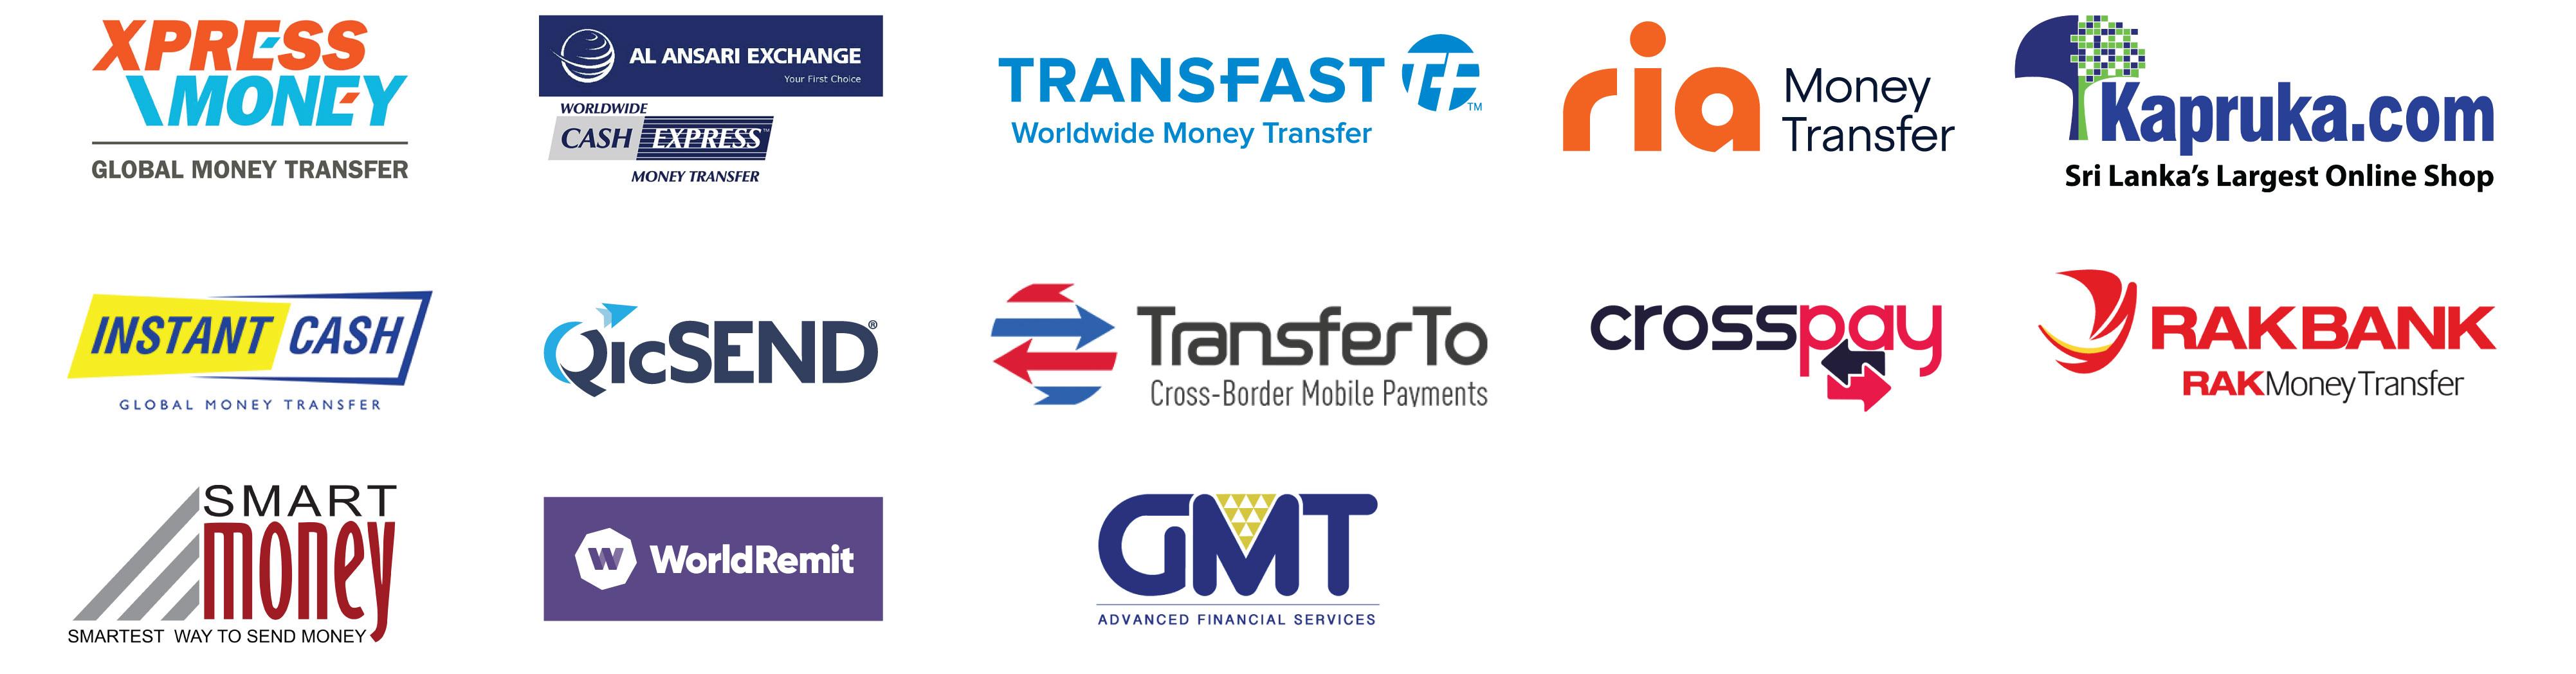 Remittance Agent Logos